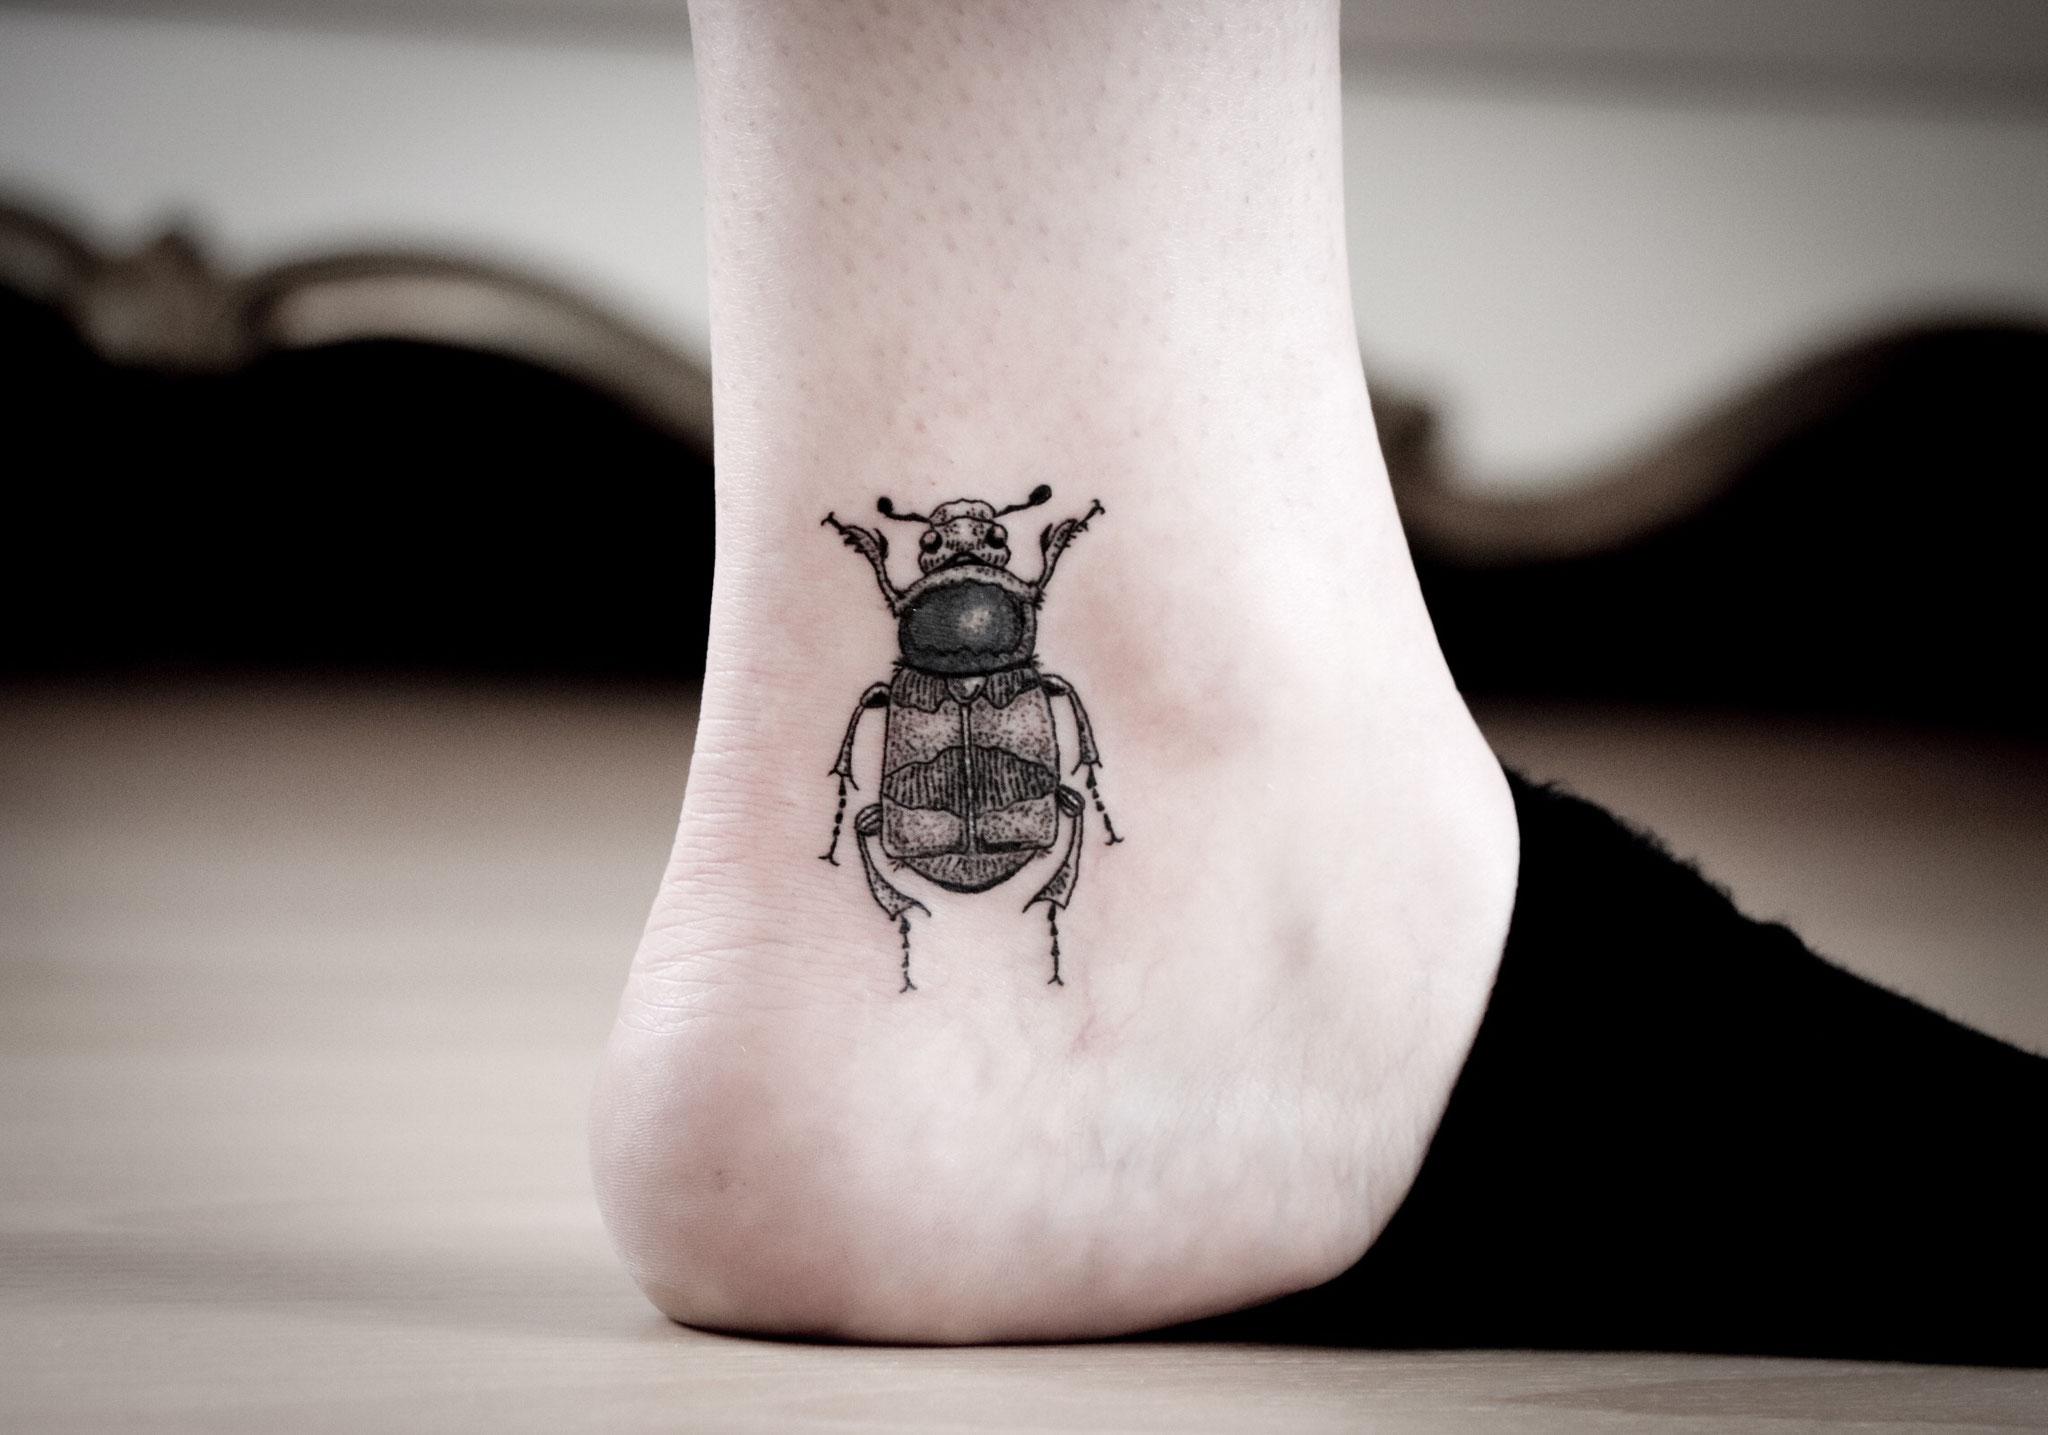 Tattoo (cover up): Bianca Stücker